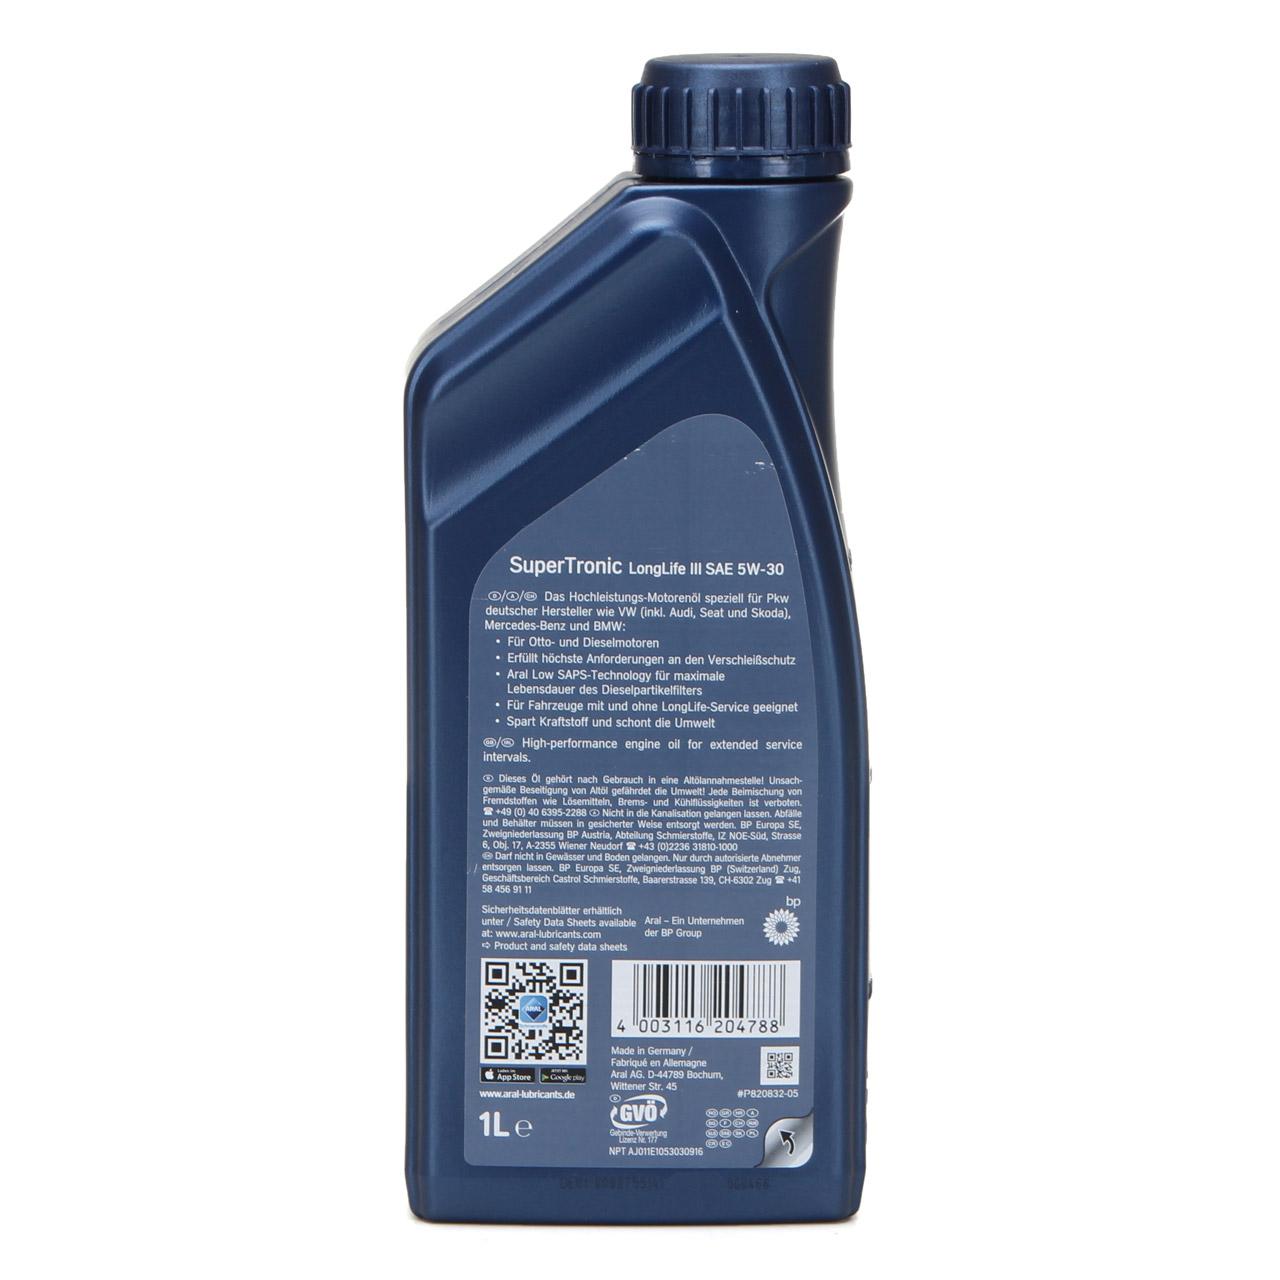 ARAL Motoröl Öl SUPER TRONIC LongLife III 5W30 für VW 504.00/507.00 - 1 Liter